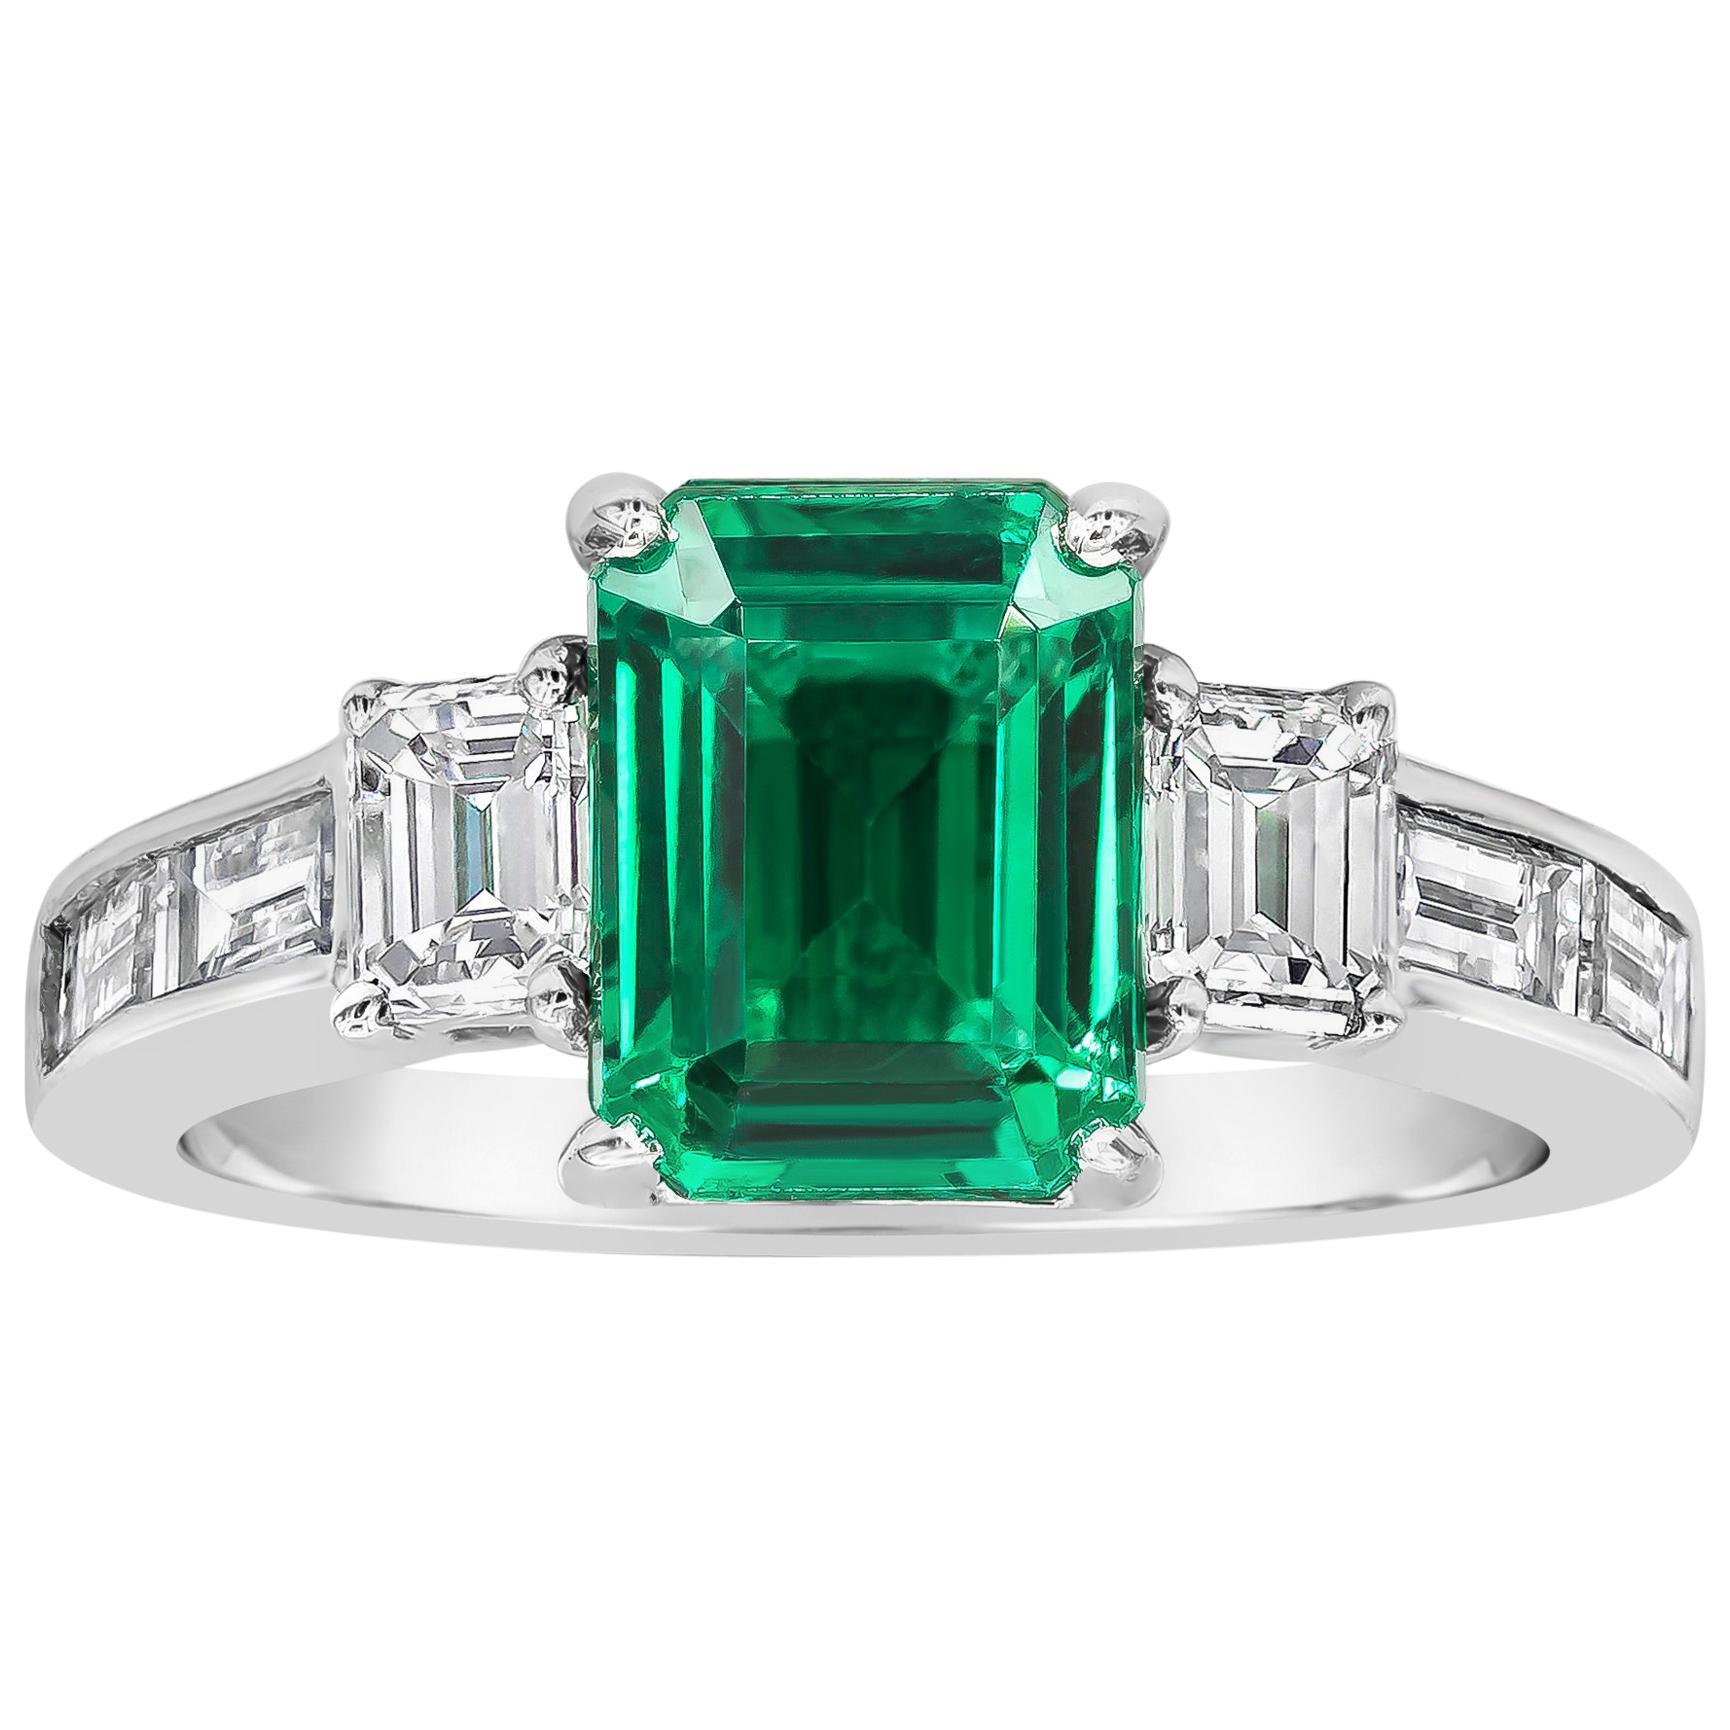 Roman Malakov, Emerald Cut Emerald and Diamond Three-Stone Engagement Ring